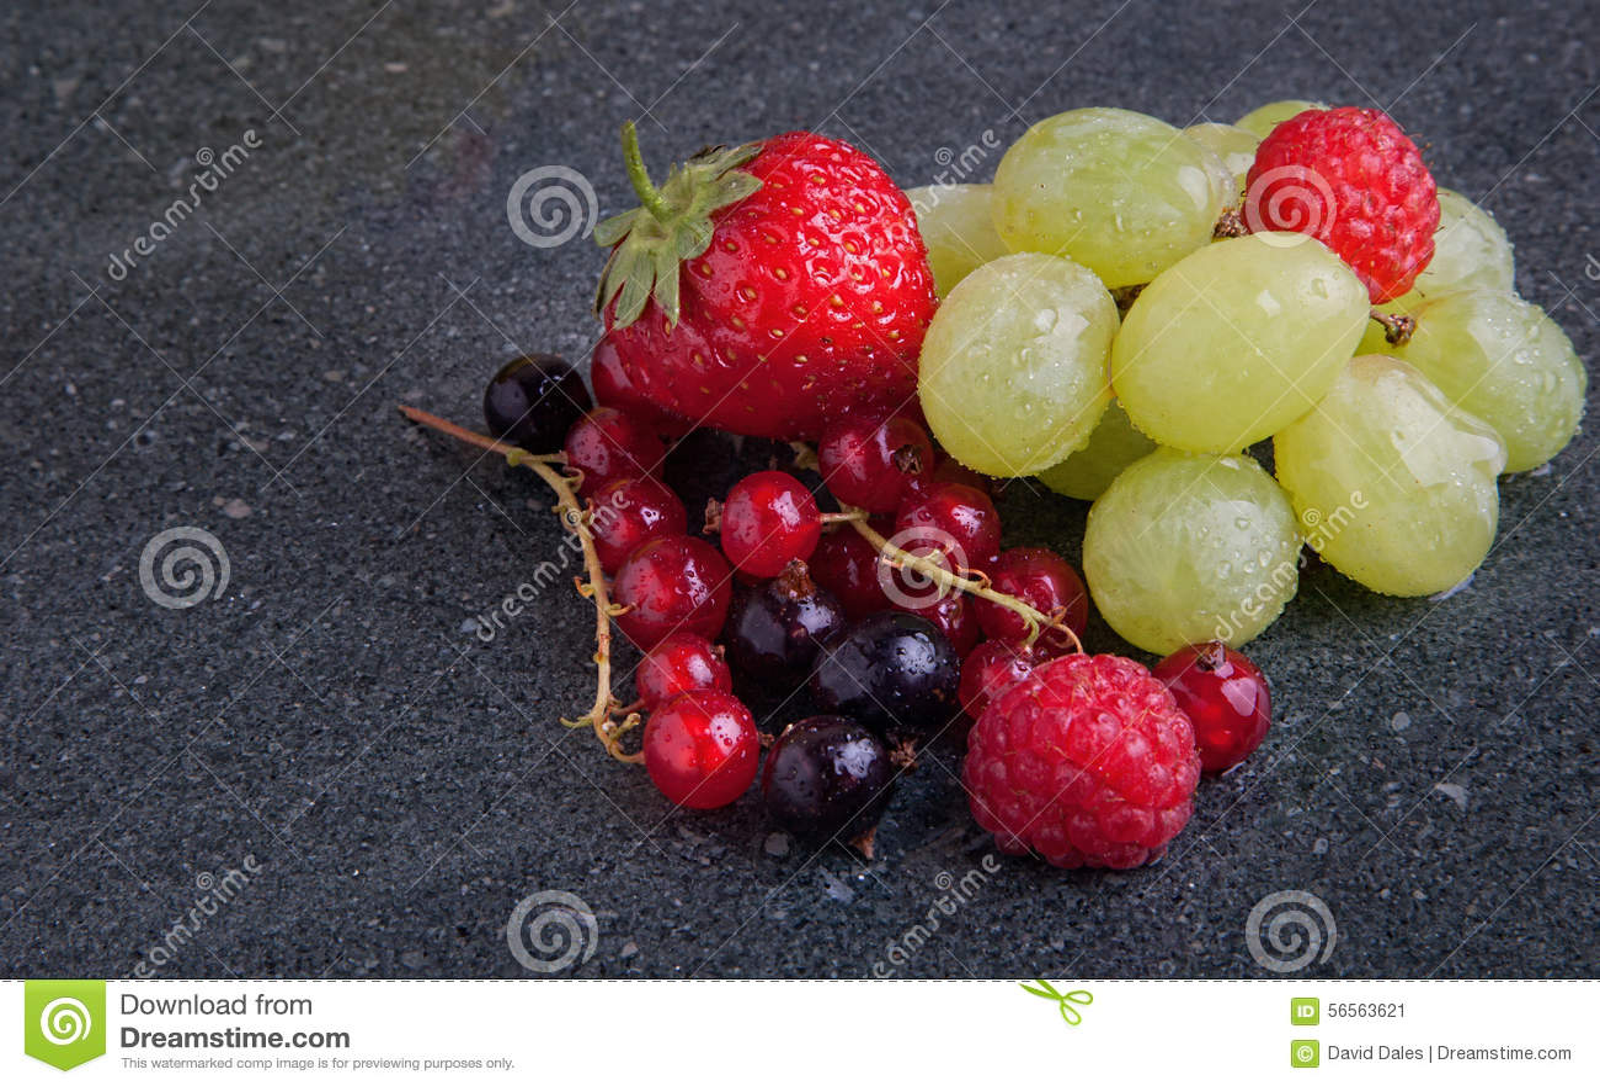 Download Θερινά φρούτα στοκ εικόνα. εικόνα από καρποί, dieting - 56563621